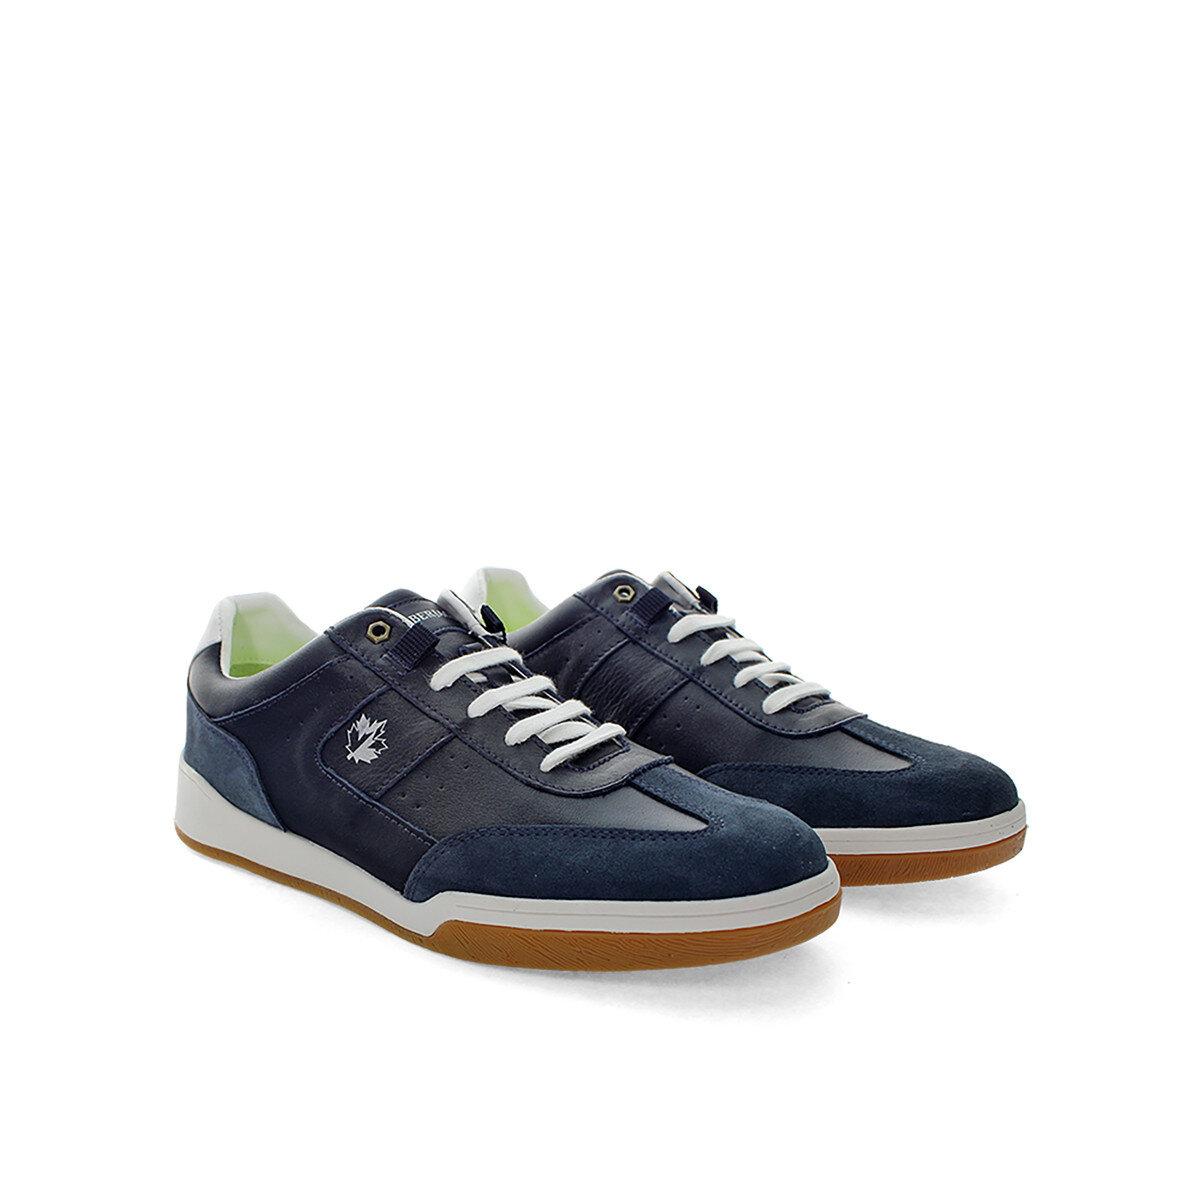 ELITE Sneakers Uomo